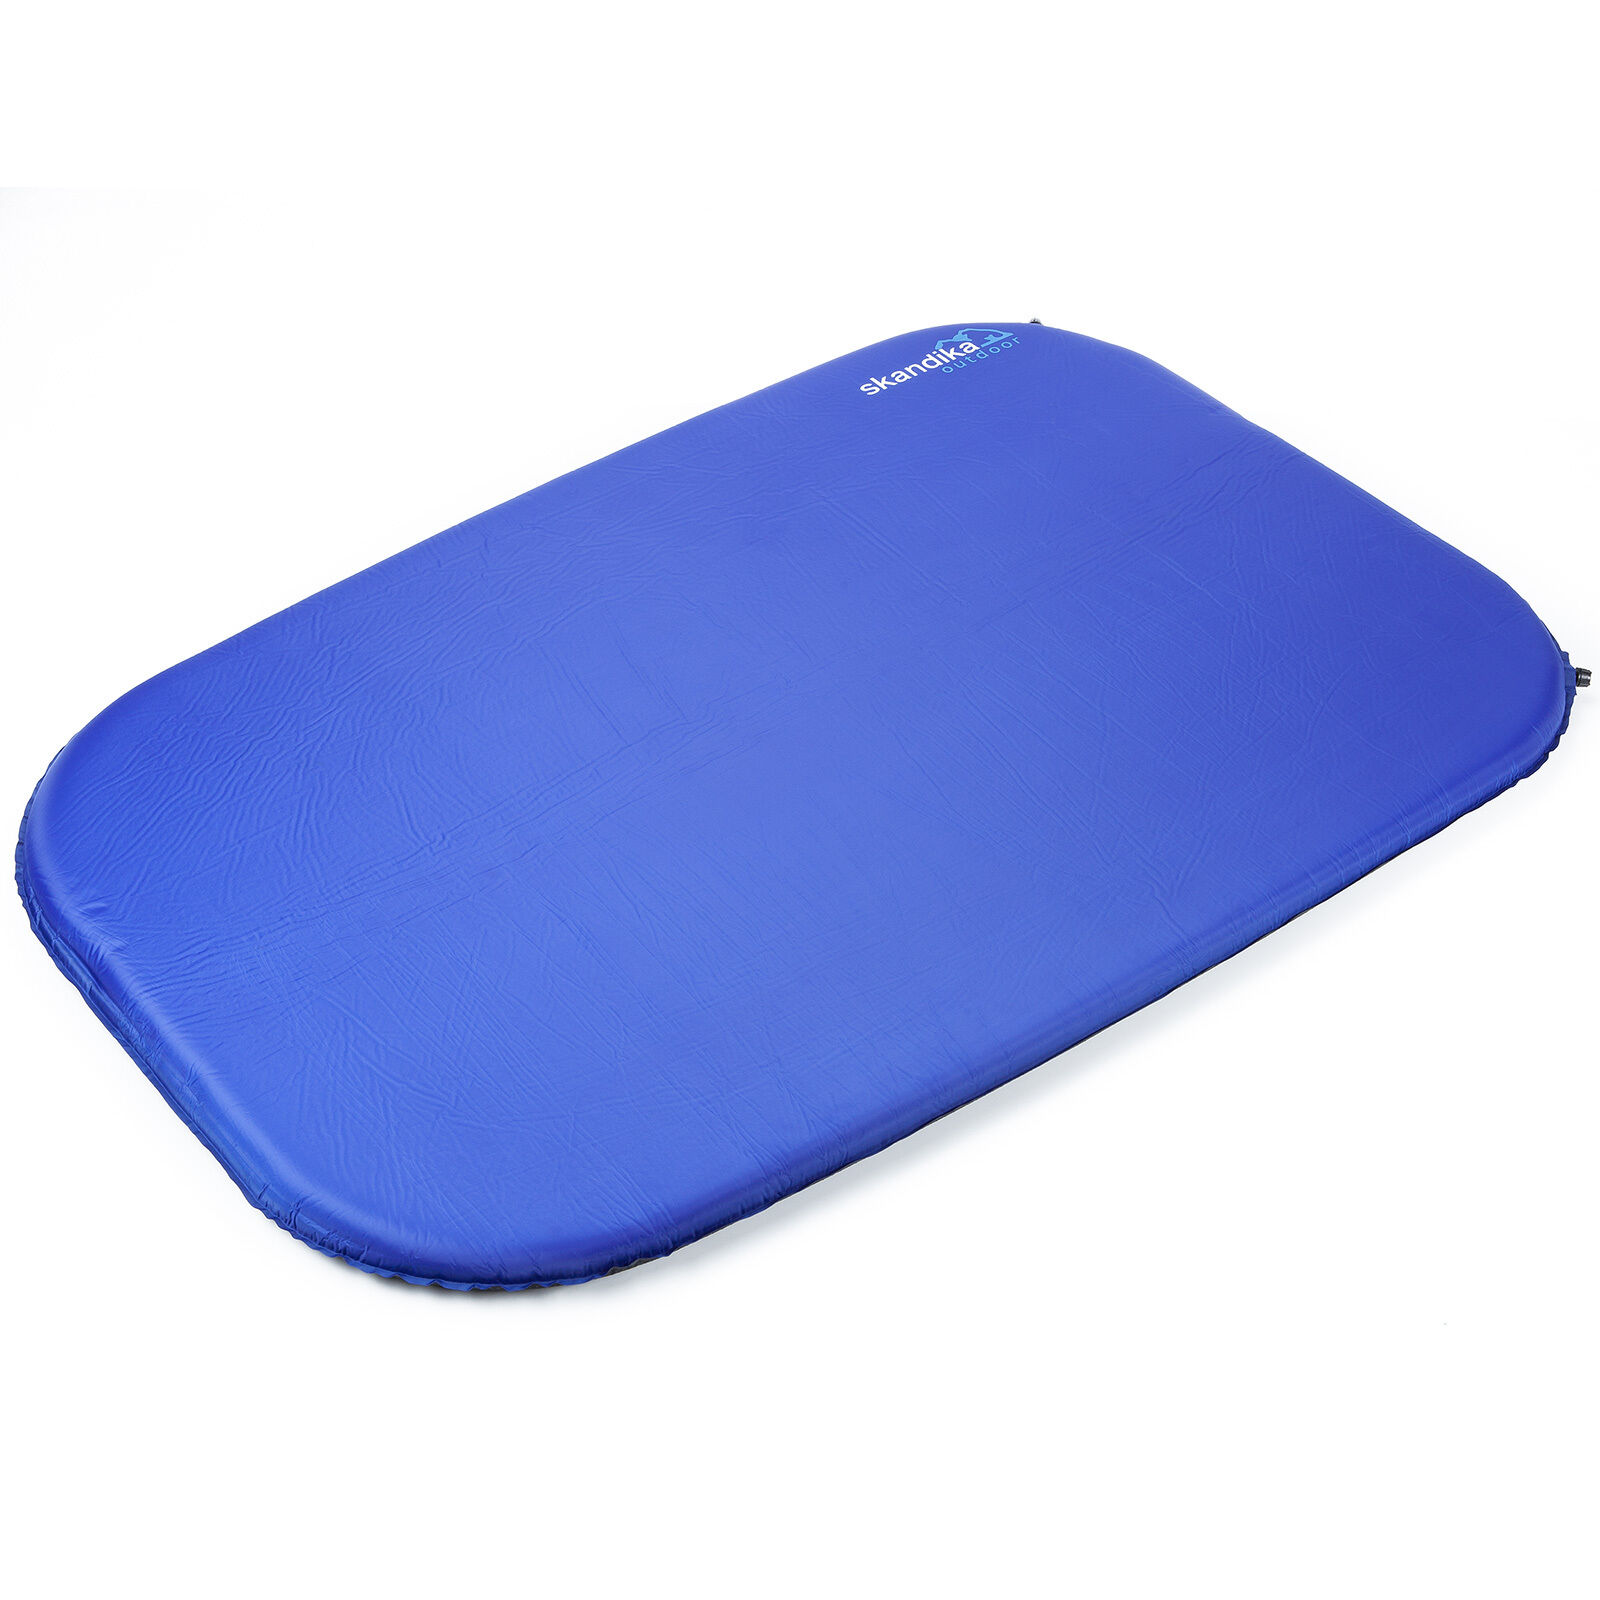 Skandika azul Night Double Sleepwell 7 cm doble-esterilla 198x130x7 nuevo